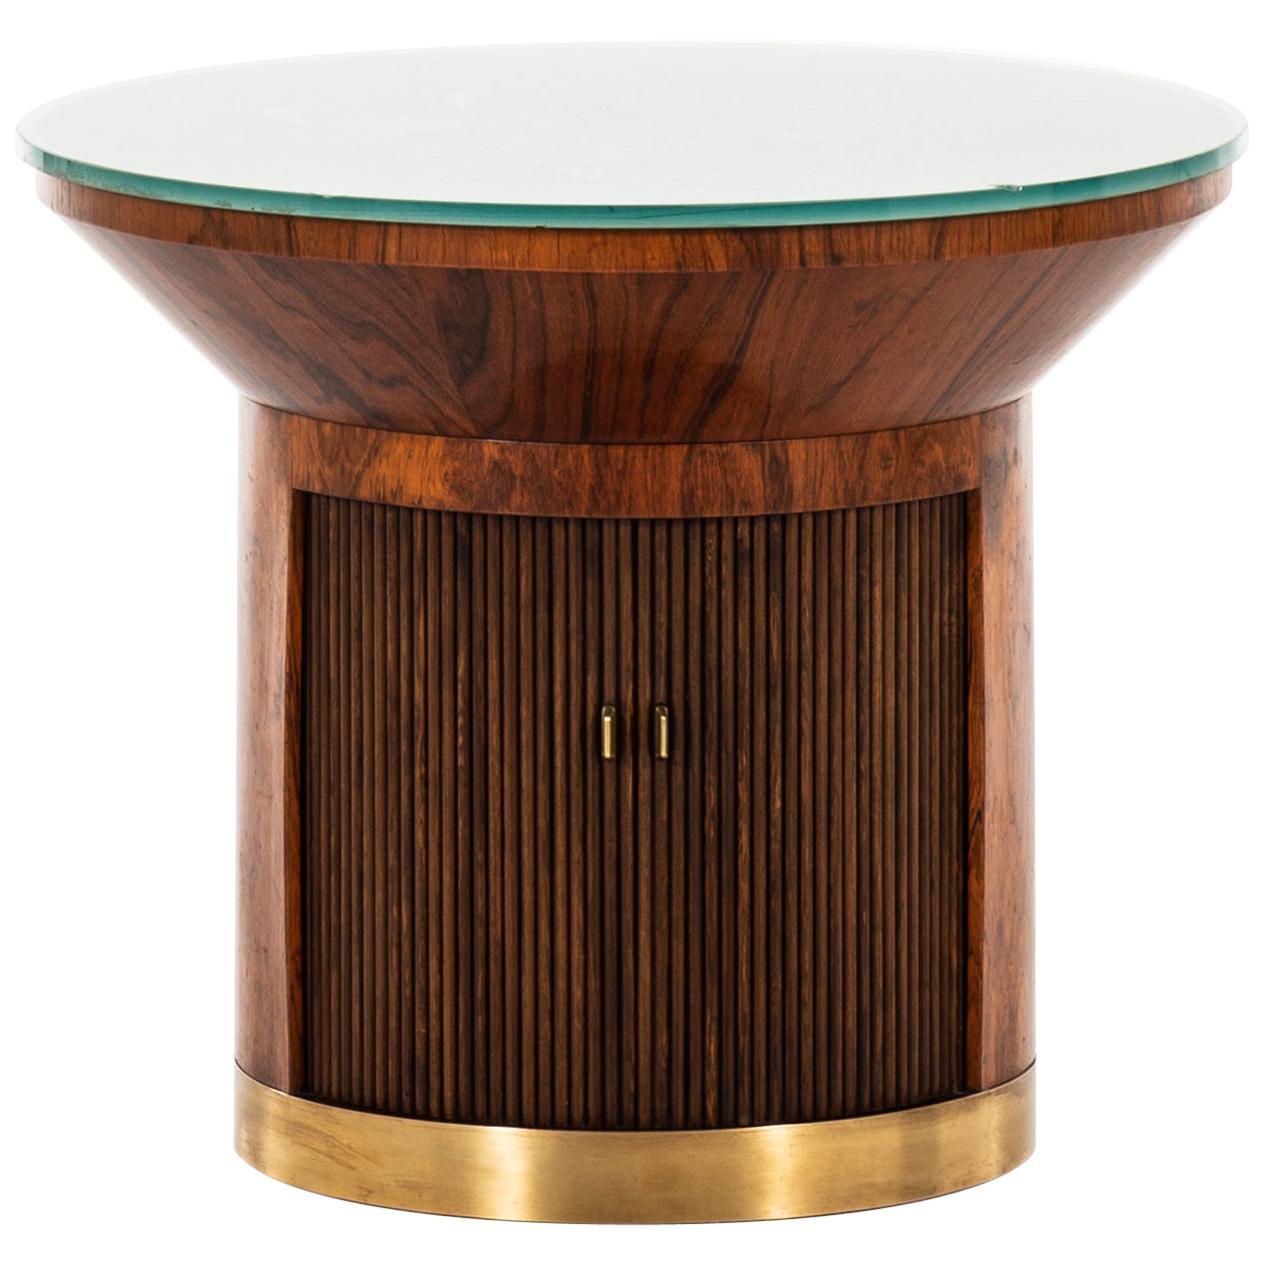 Ernst Kühn Coffee Table / Bar Cabinet by Lysberg Hansen & Therp in Denmark